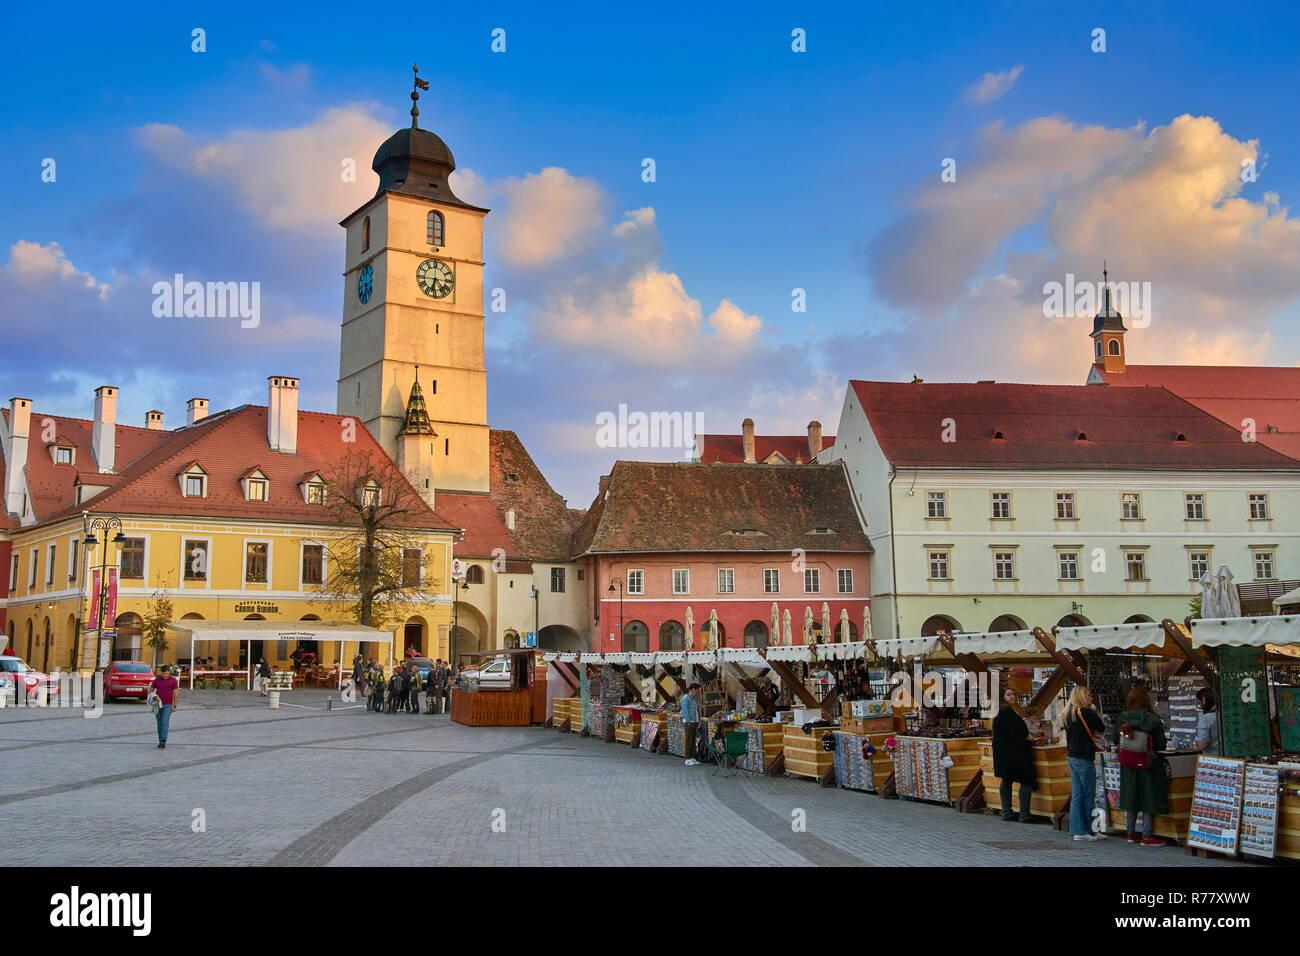 Sibiu old town, Transylvania, Romania Stock Photo